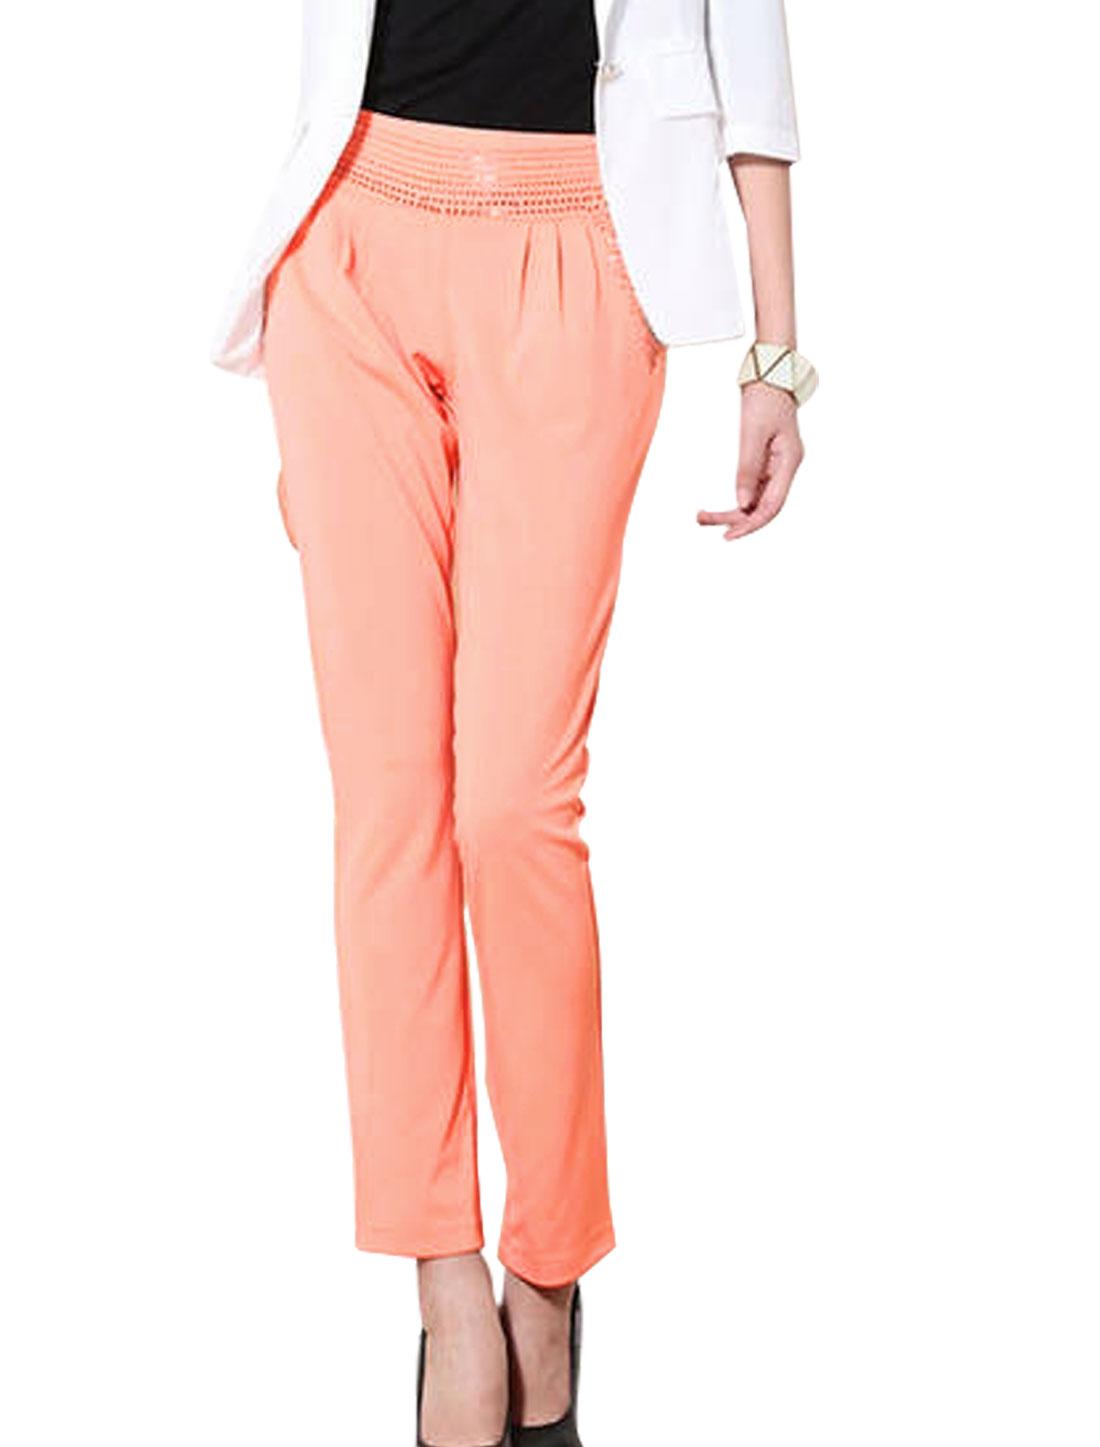 Women Slant Pockets Rhinestone Decor Soft Leisure Pants Light Pink S